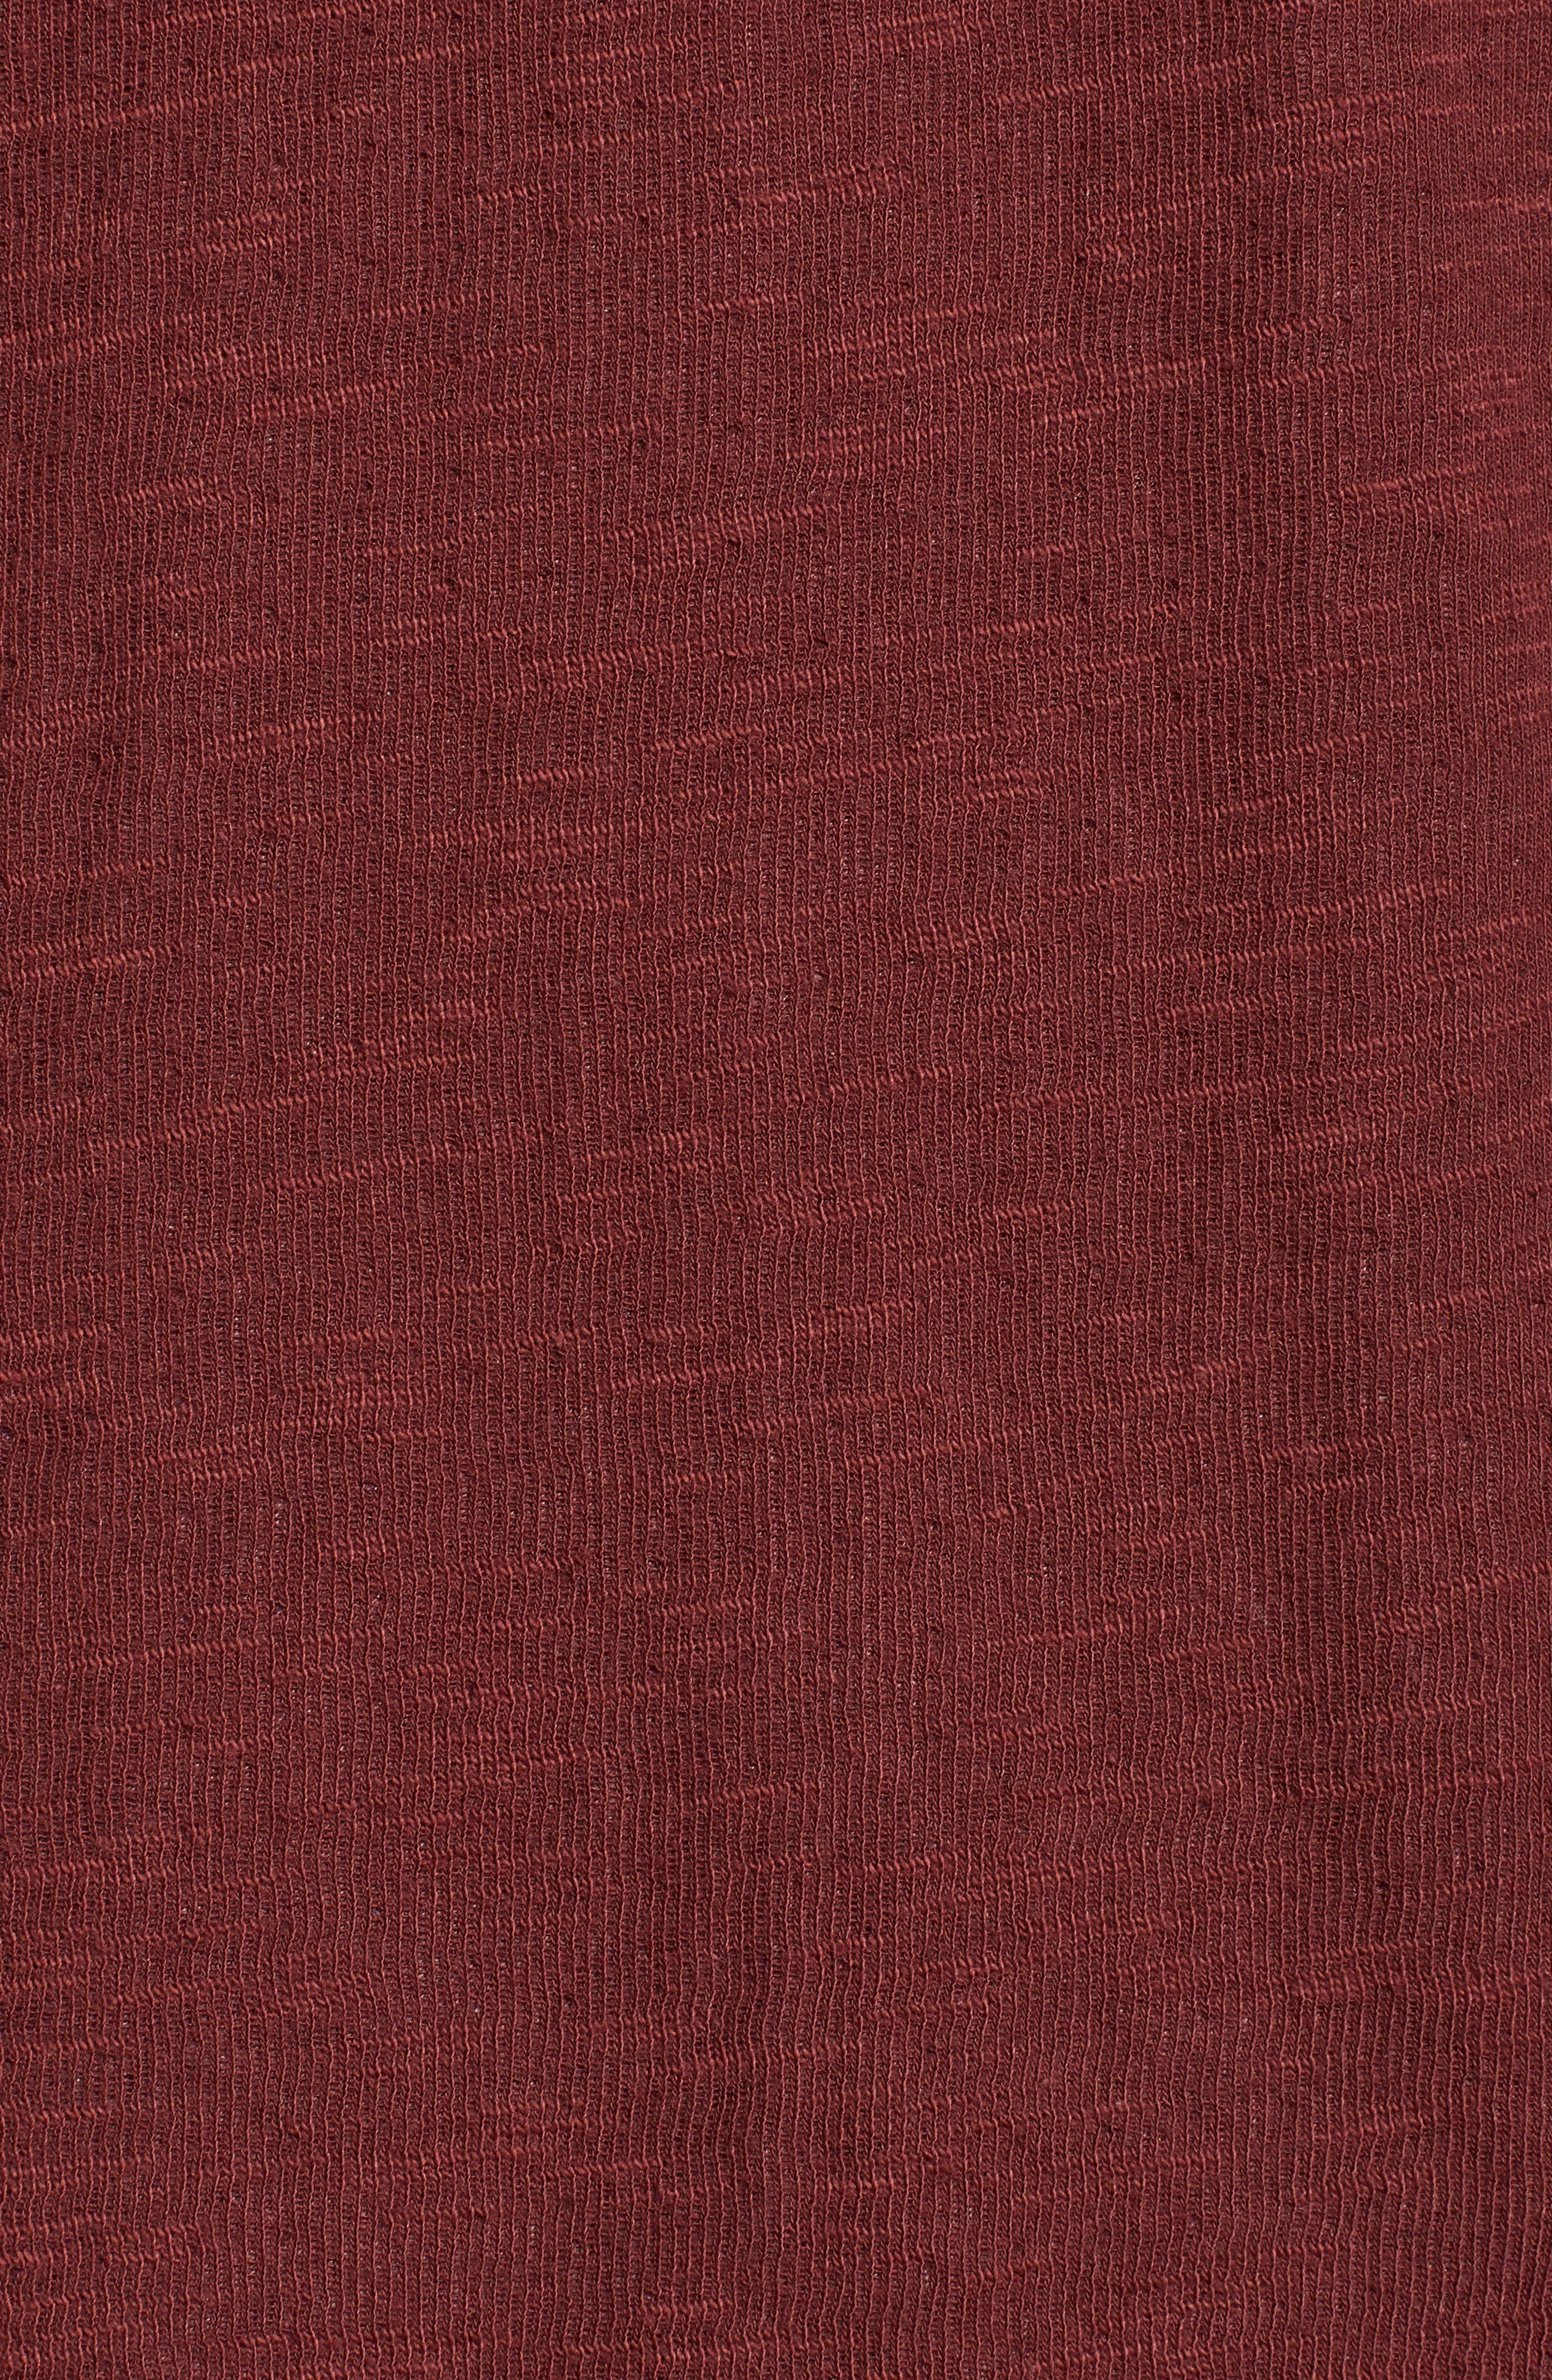 Double Layer Slim Crewneck T-Shirt,                             Alternate thumbnail 5, color,                             Andorra